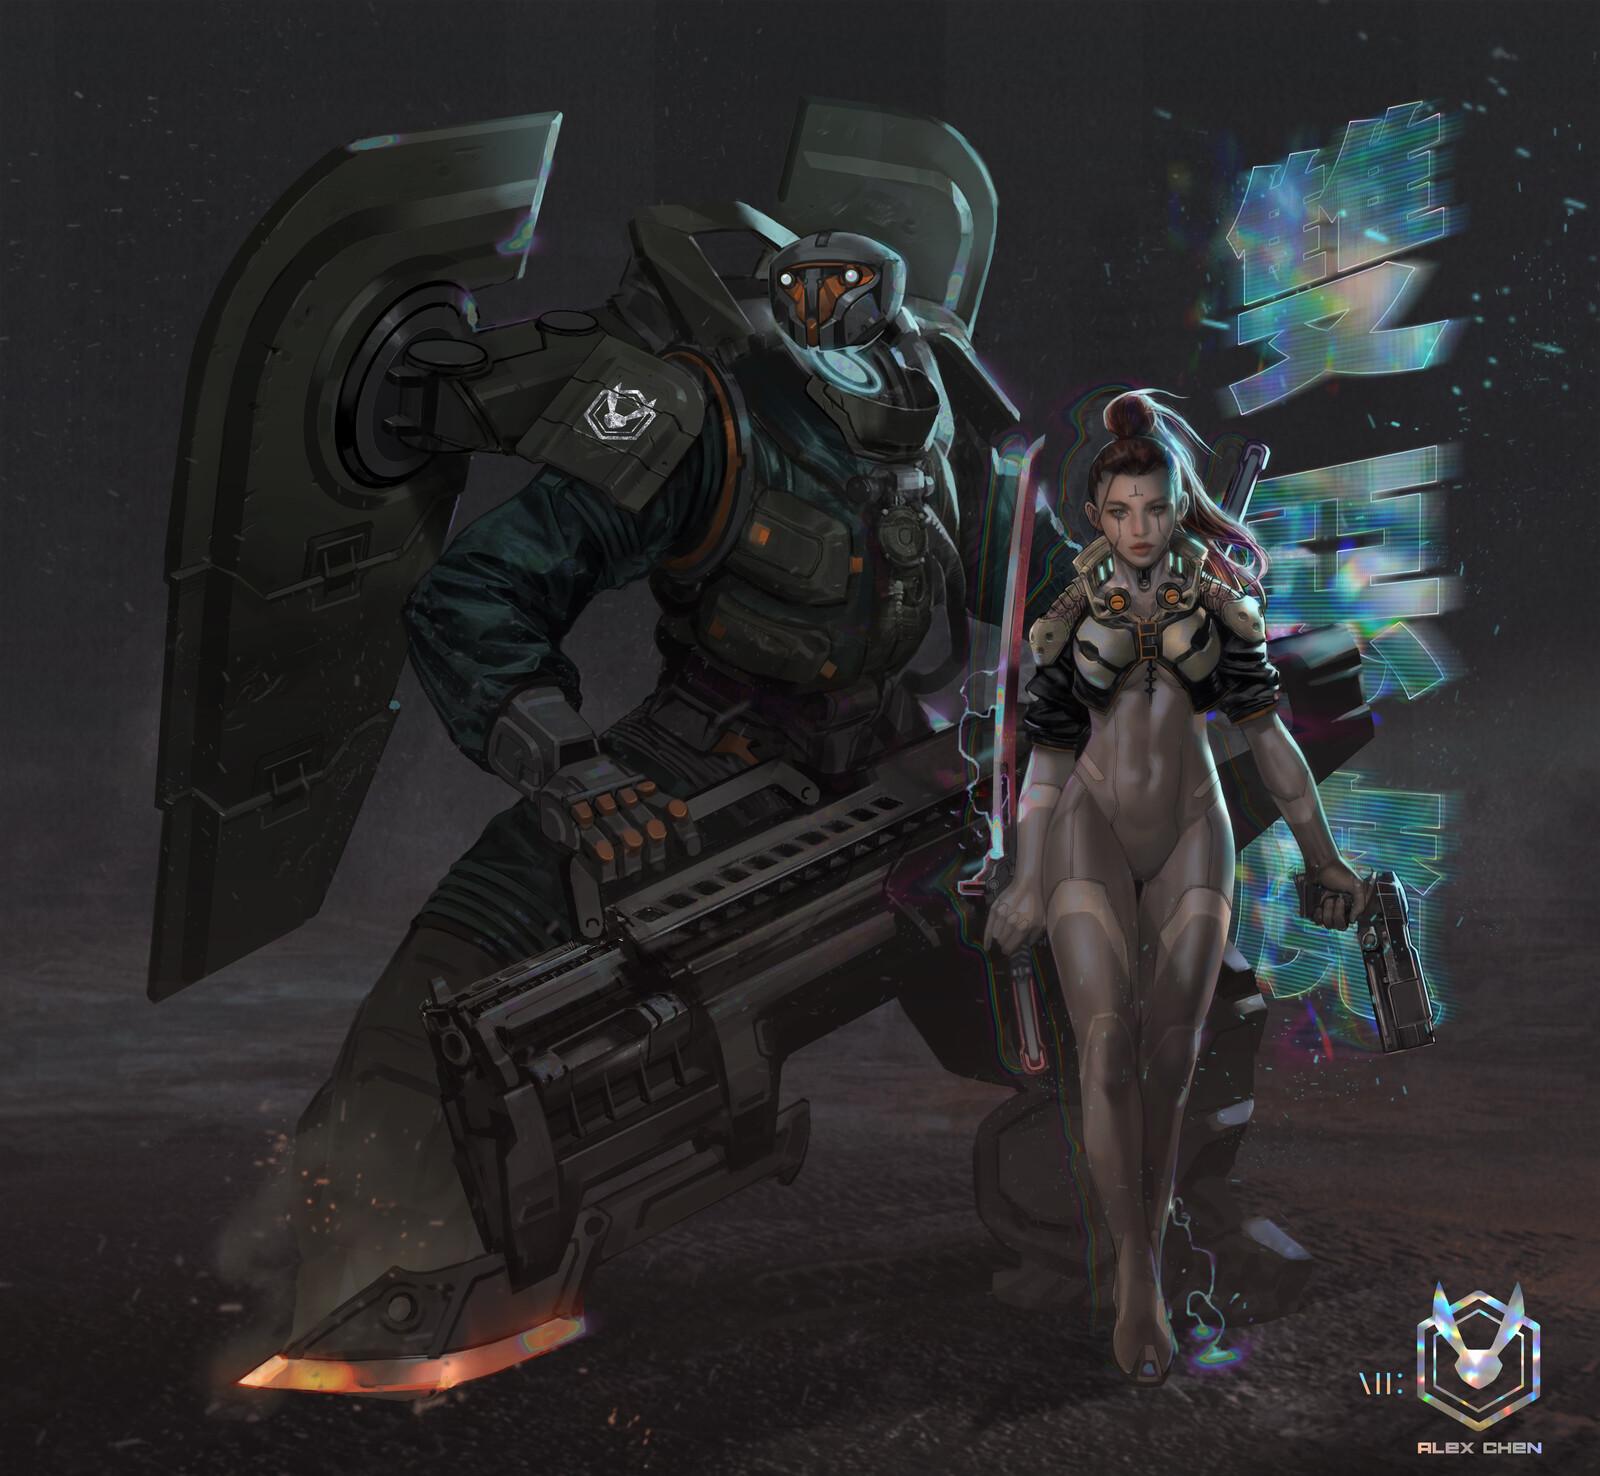 Tortoise and Hare - Cyberpunk 2077 fanart